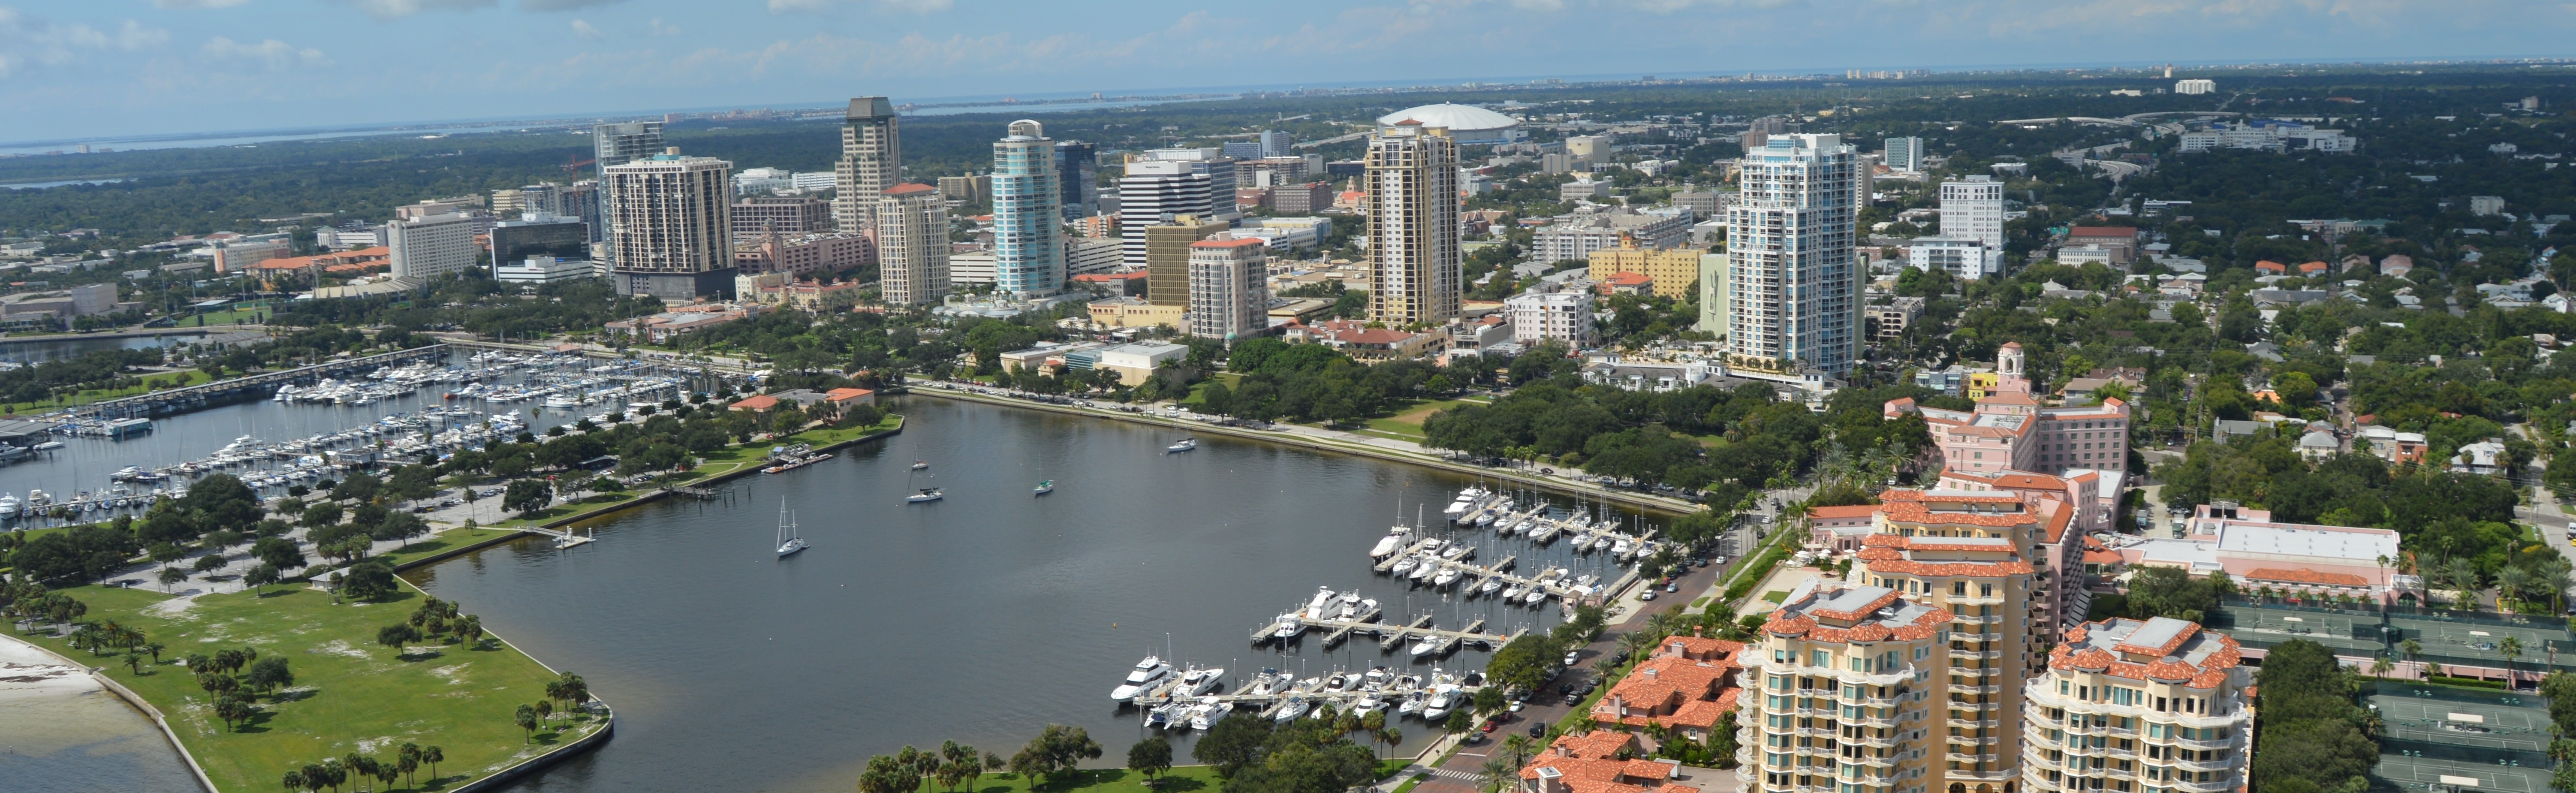 Tampa Bay - banner